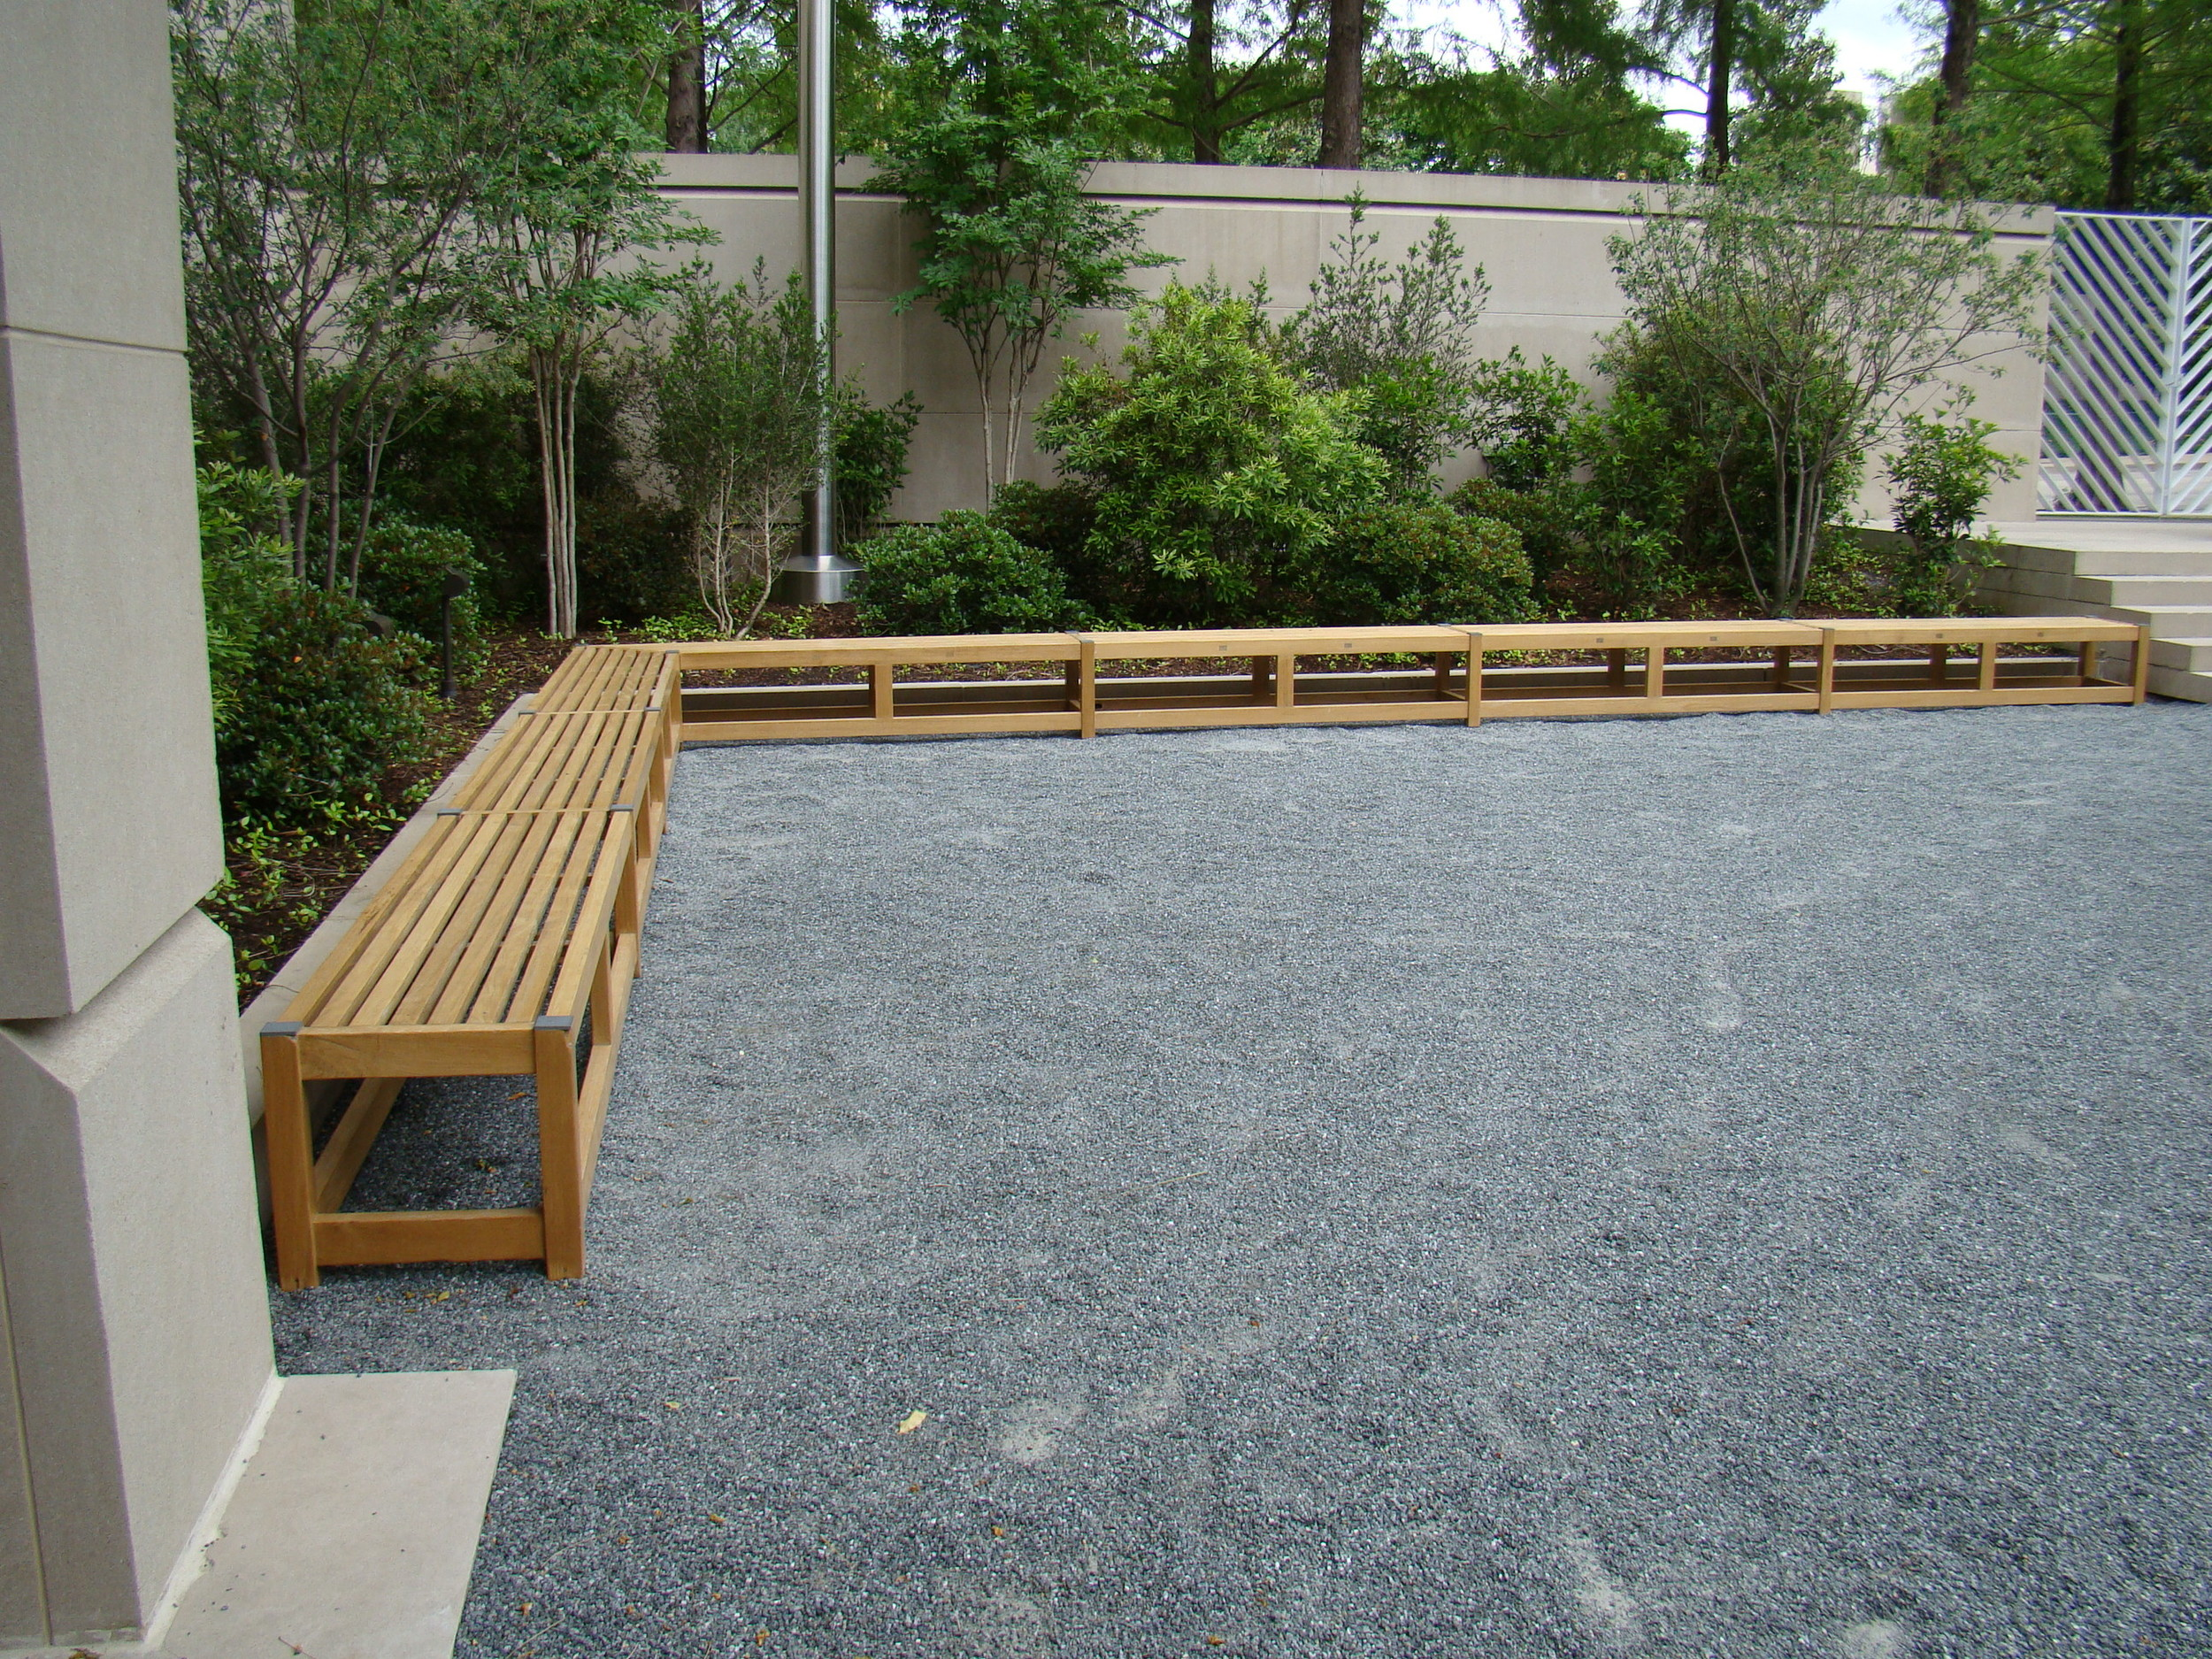 Dallas Museum of Art Bench Refinishing